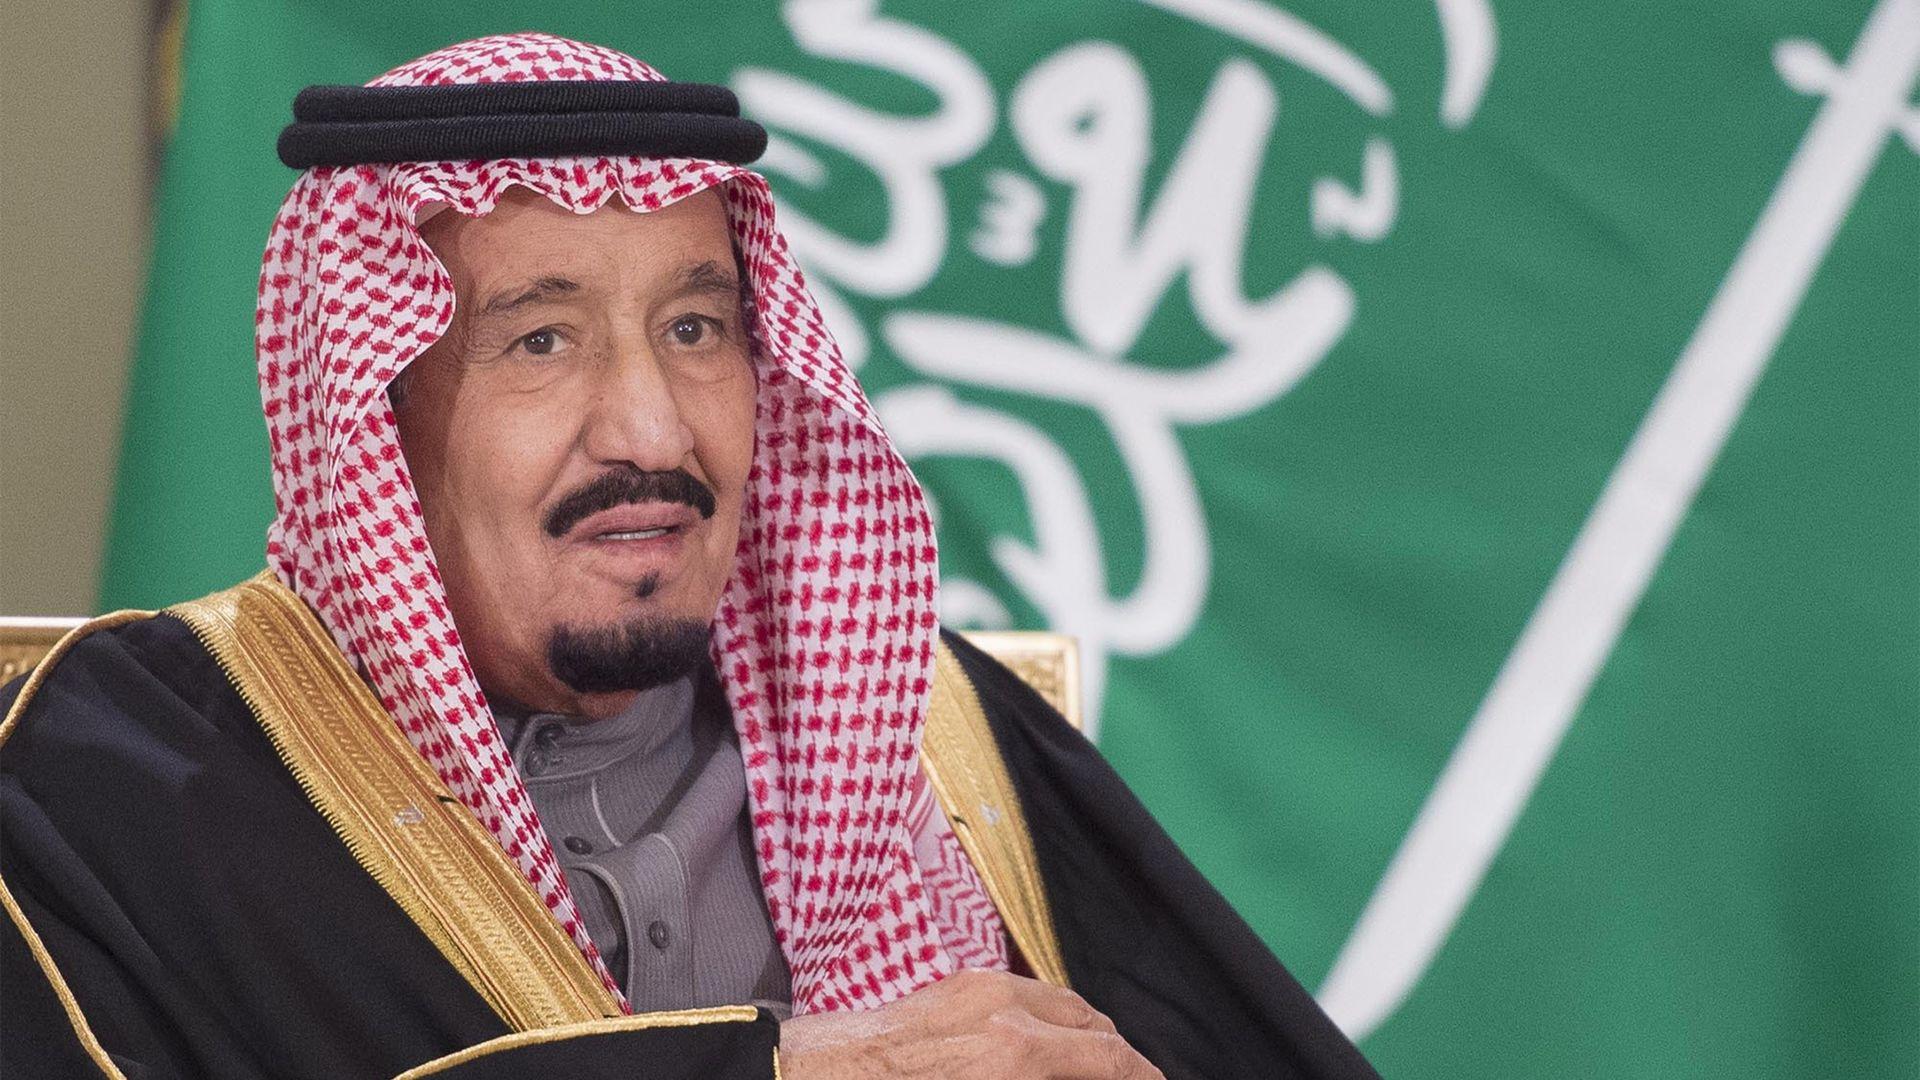 King of Saudi Arabia, Salman bin Abdulaziz Al Saud